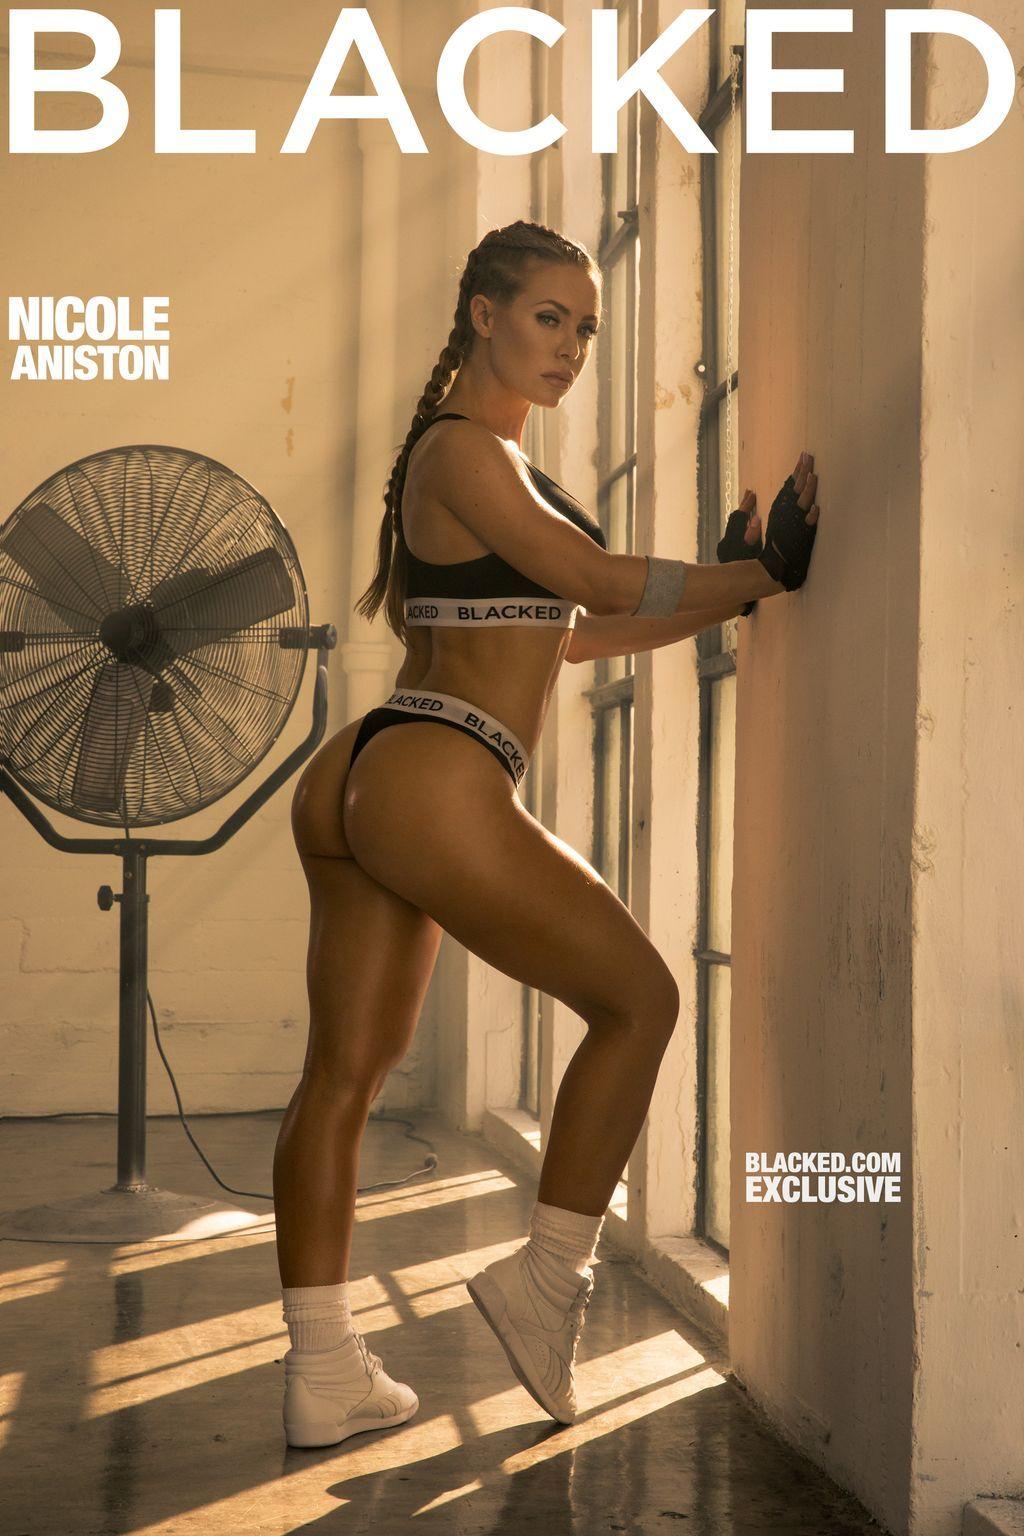 [Blacked] Nicole Aniston - Work Hard, Play Hard (25.05 ...